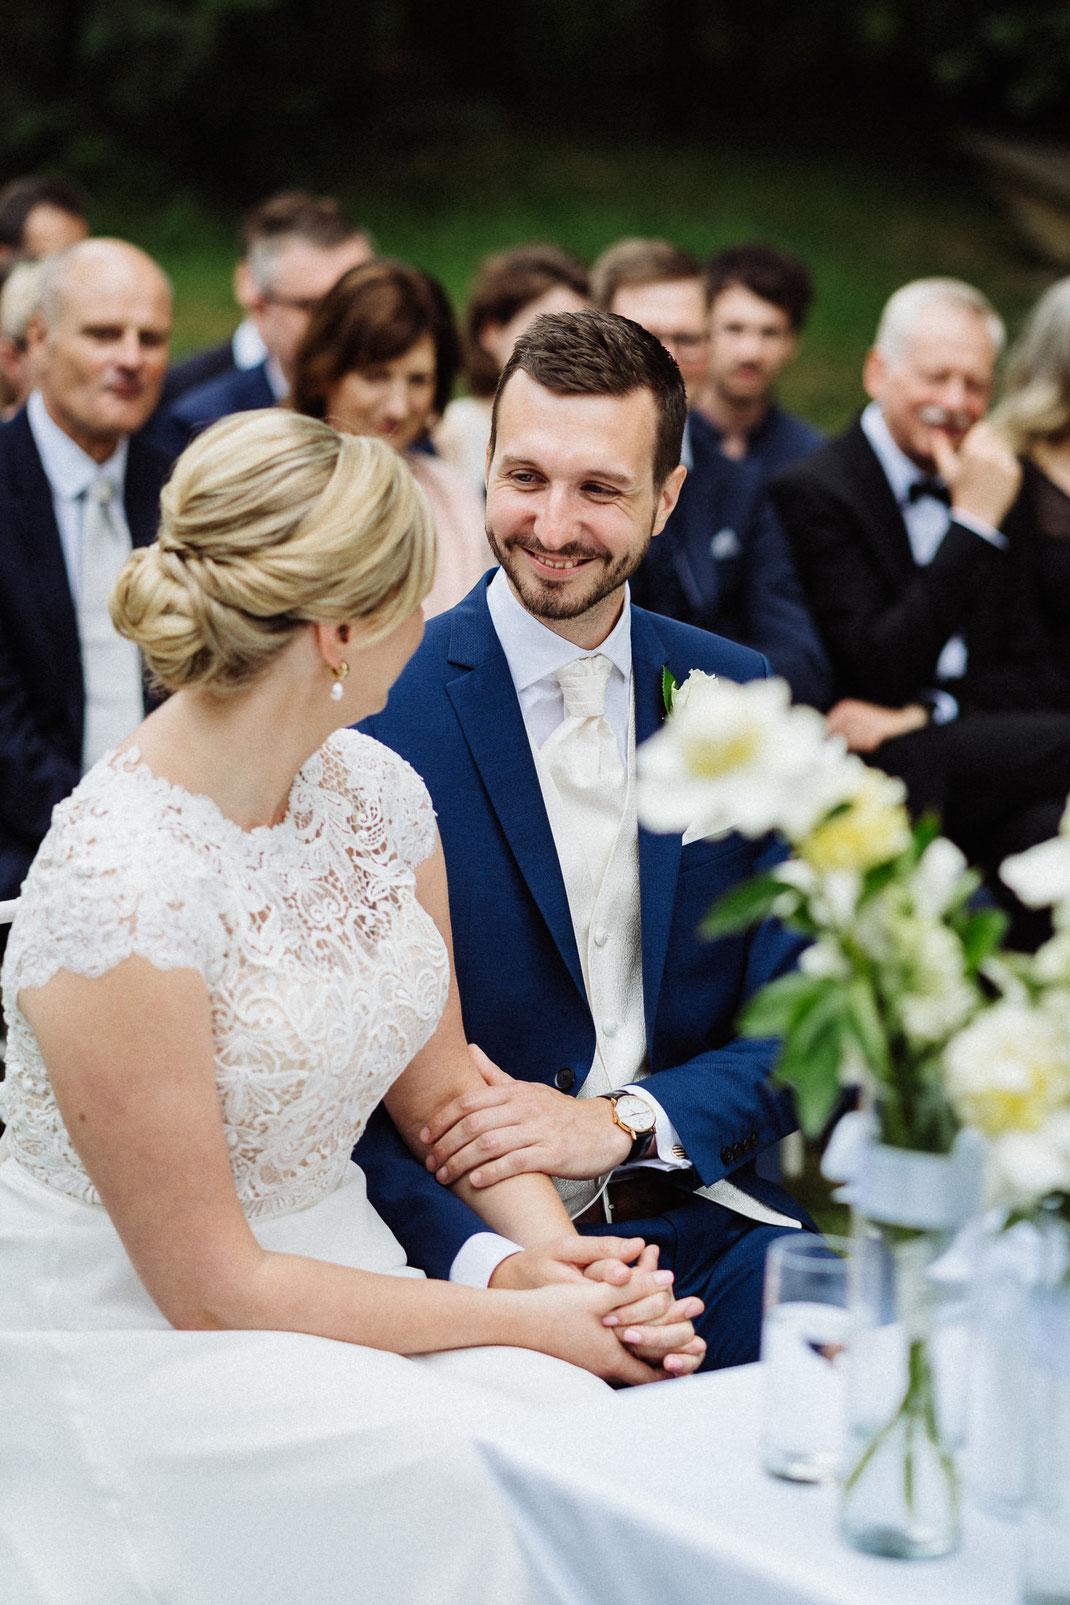 Paar Bräutigam Trauung umarmen